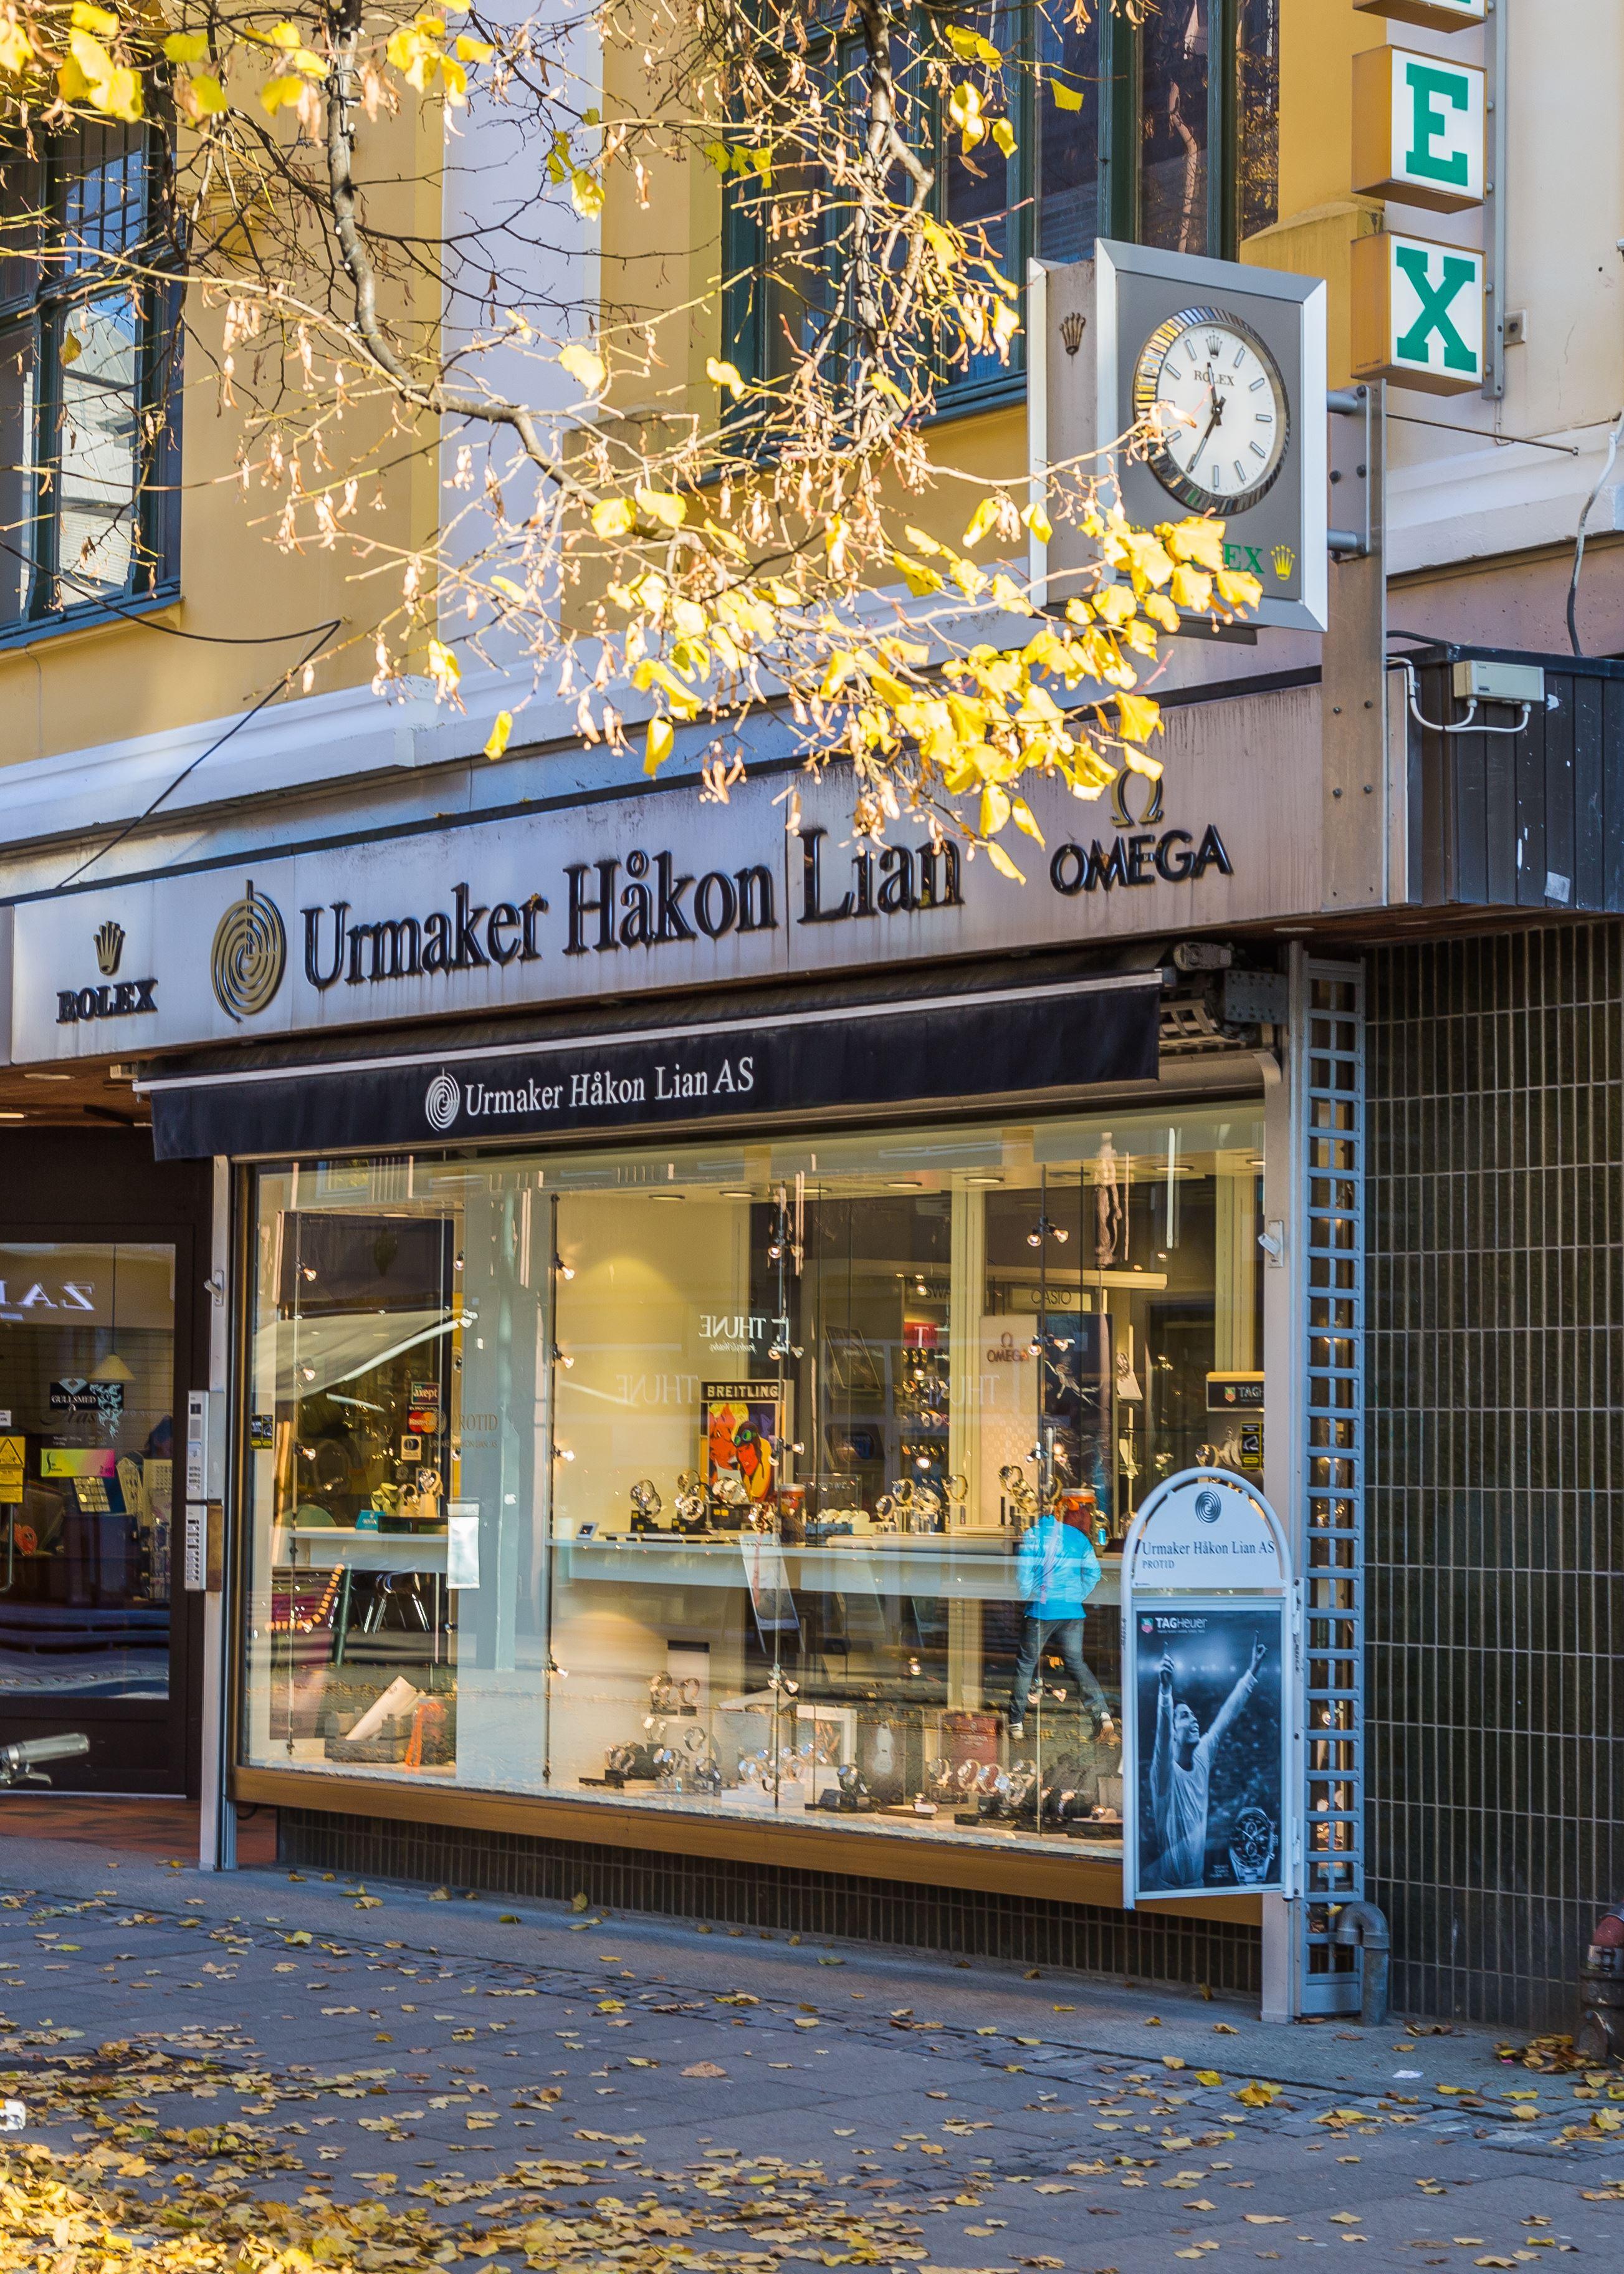 Visit Trondheim, Urmaker Håkon Lian